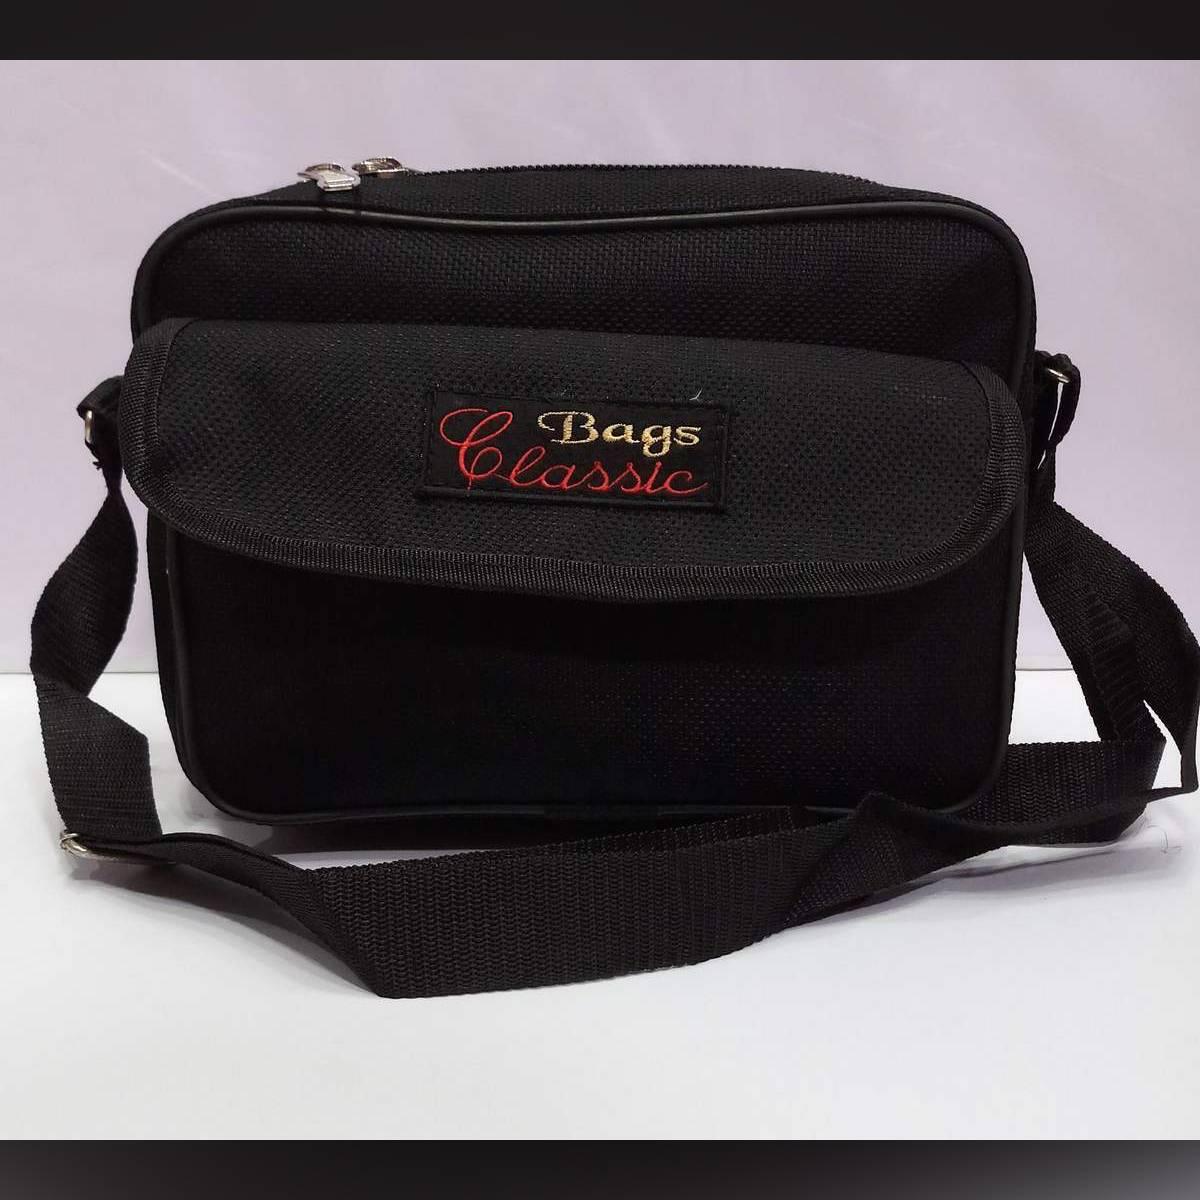 Hajj&Umrah, Madrassa, Travel, More Other Purpose Waterproof Small Vertical Shoulder Bag (Black)